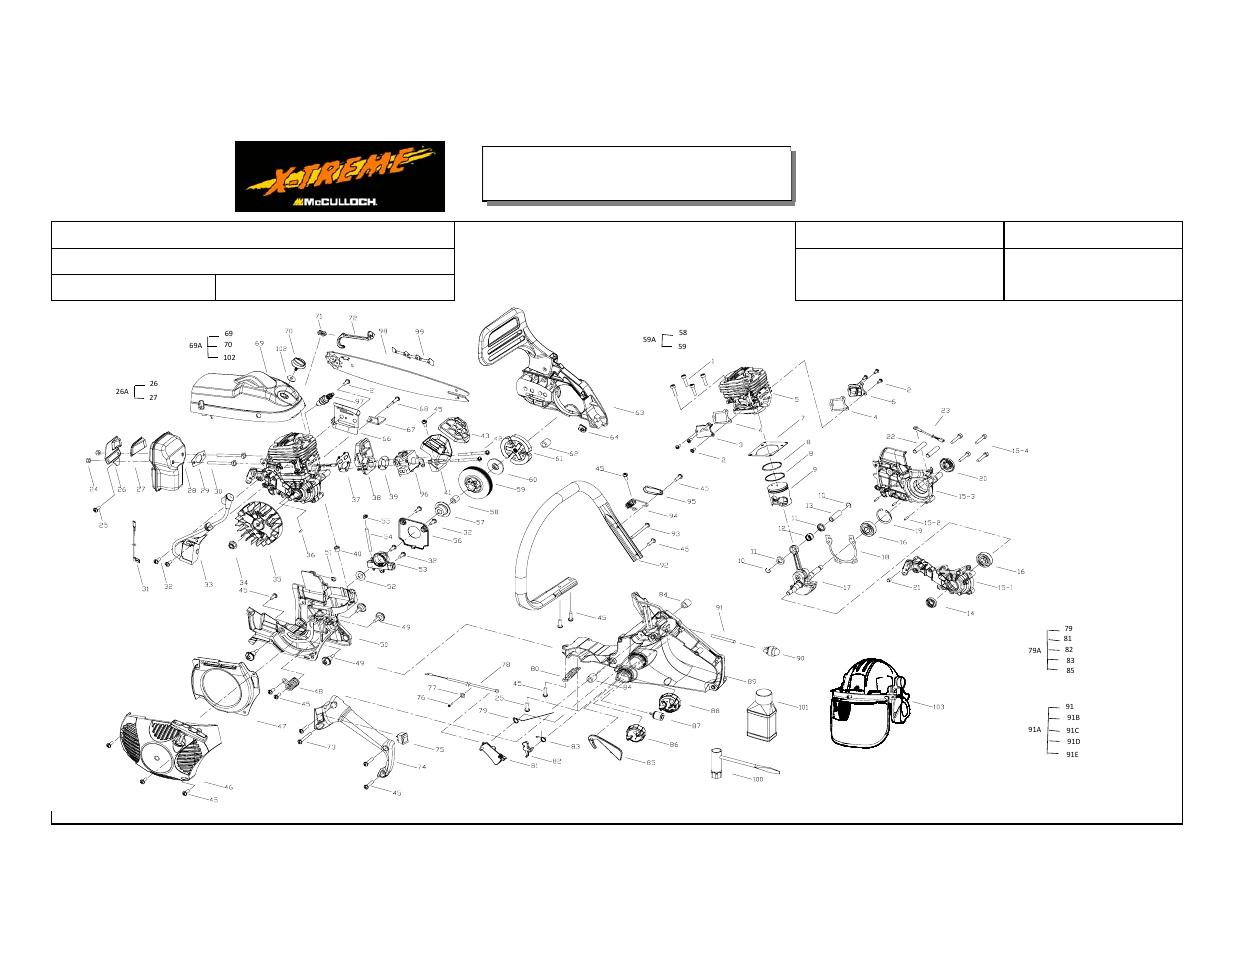 Iplmxc1840dk pg1.pdf, Model no. mxc1840dk service spare